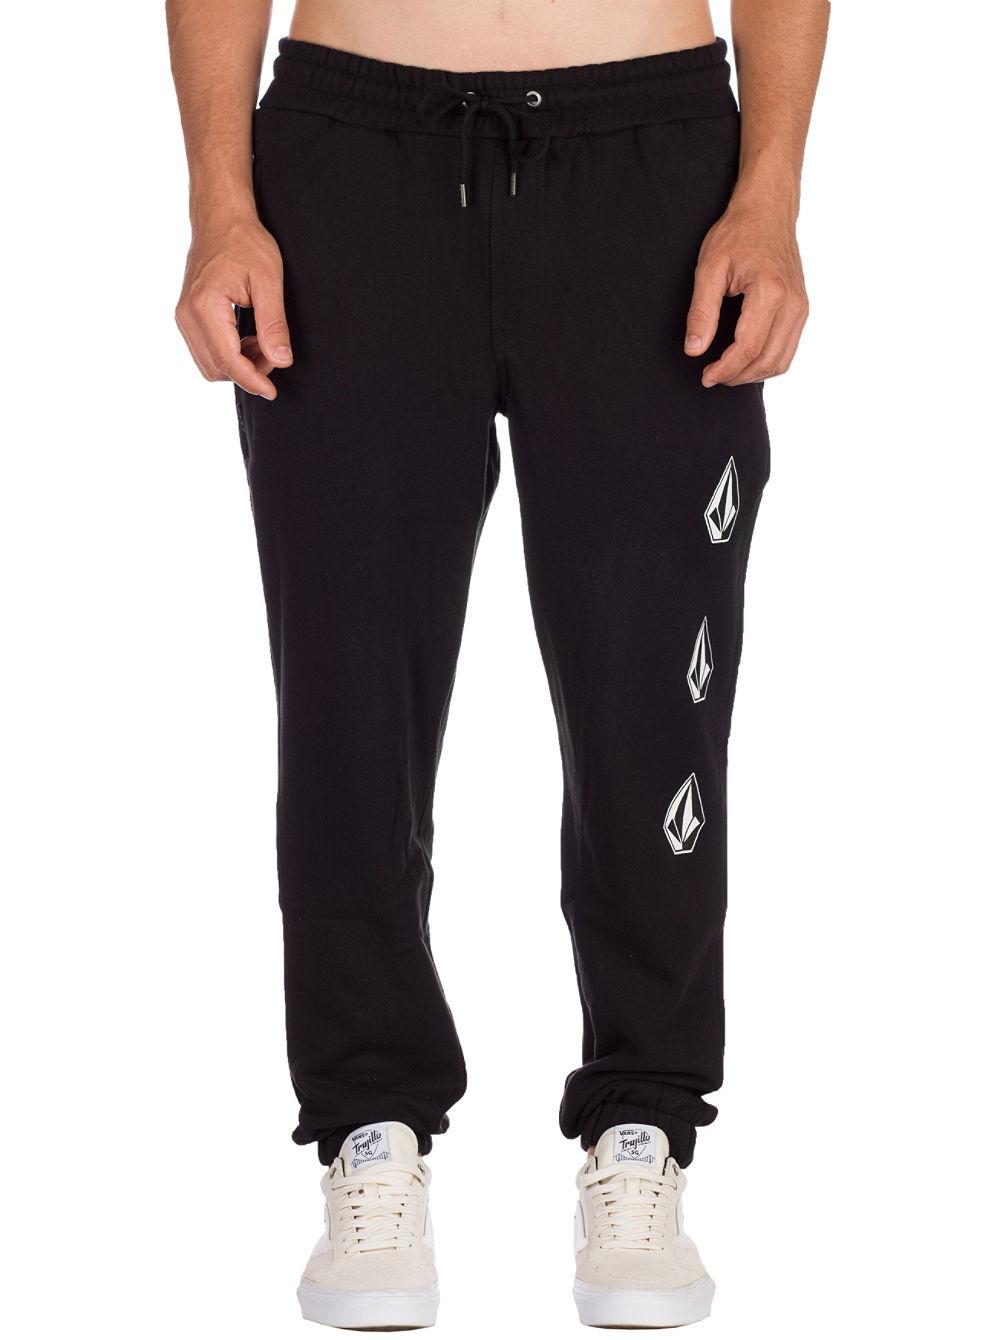 Buy Volcom Deadly Stones Jogging Pants online at blue-tomato.com 096c8feb446a